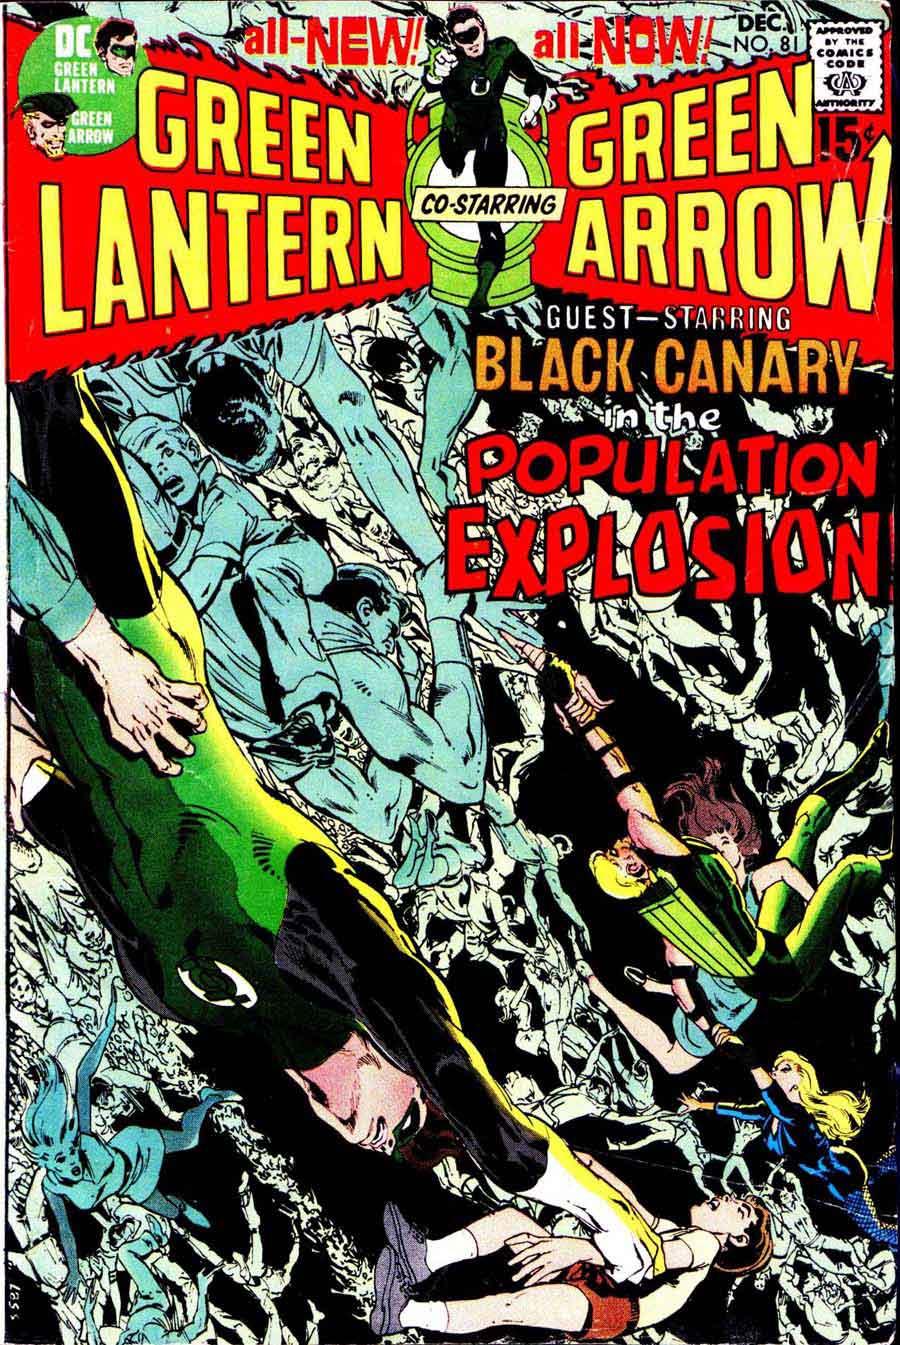 Green Lantern Green Arrow #81 dc comic book cover art by Neal Adams